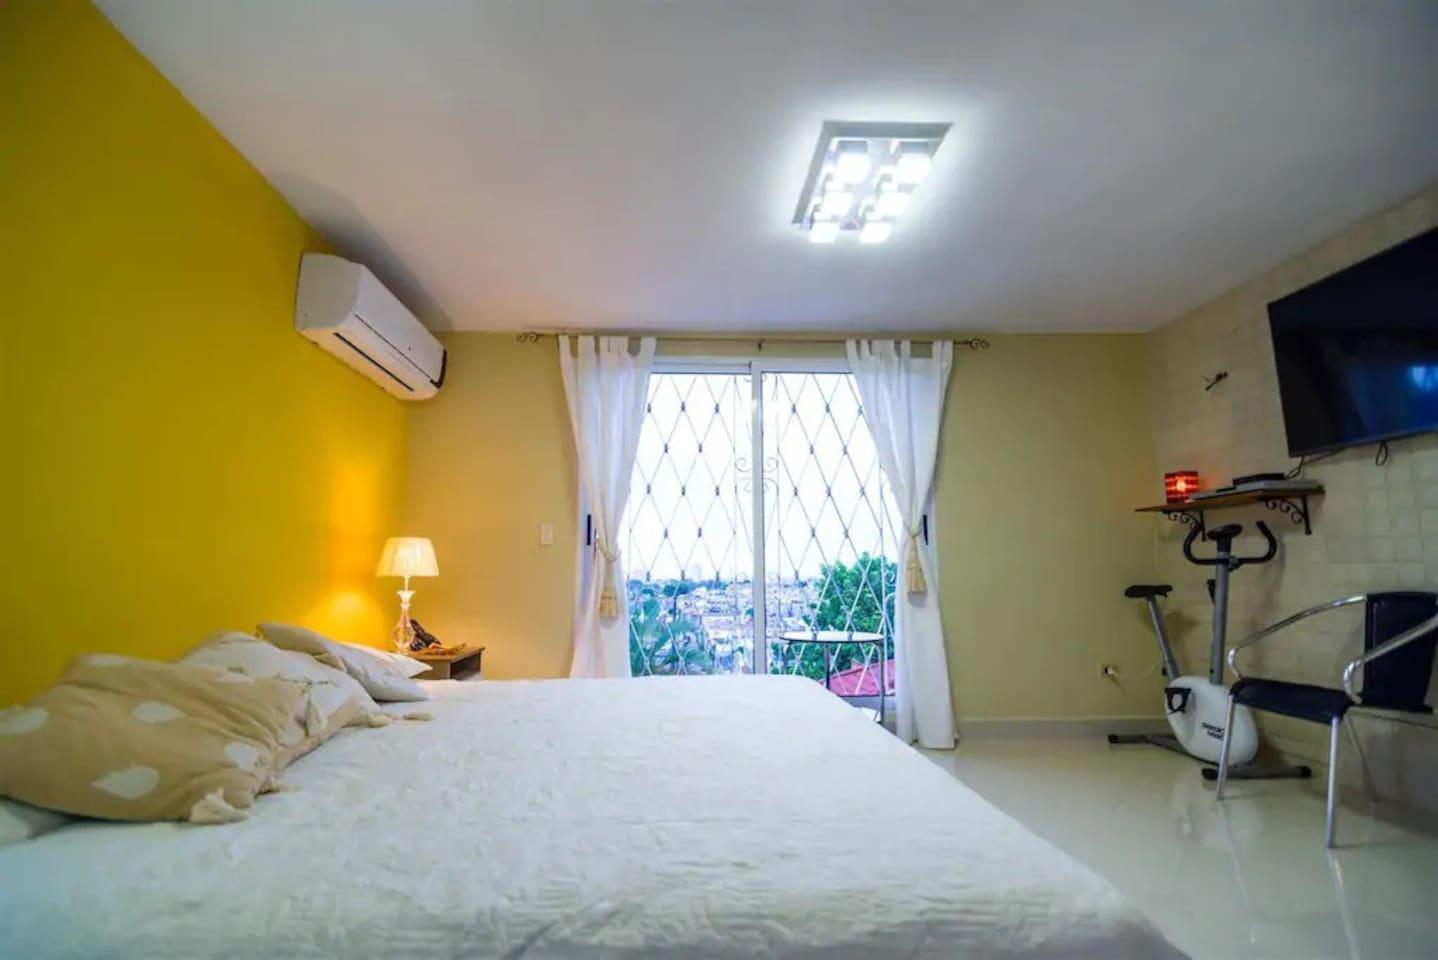 Apartment Villa Don Teto Suite   8 Rooms  Great Havana View photo 16816163